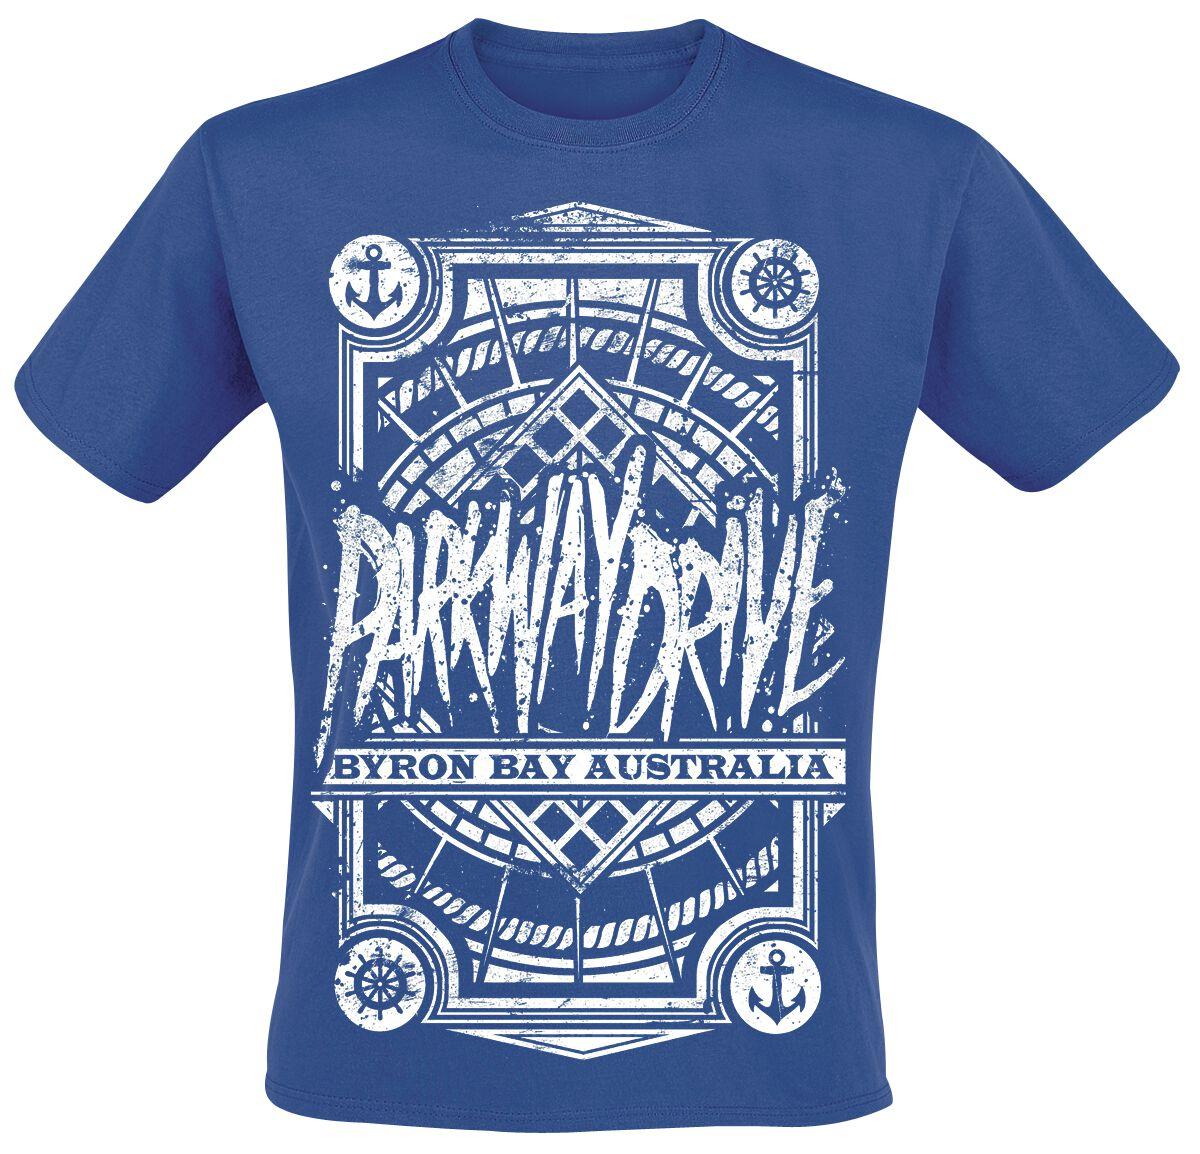 Zespoły - Koszulki - T-Shirt Parkway Drive Byron Bay T-Shirt błękitny - 243493